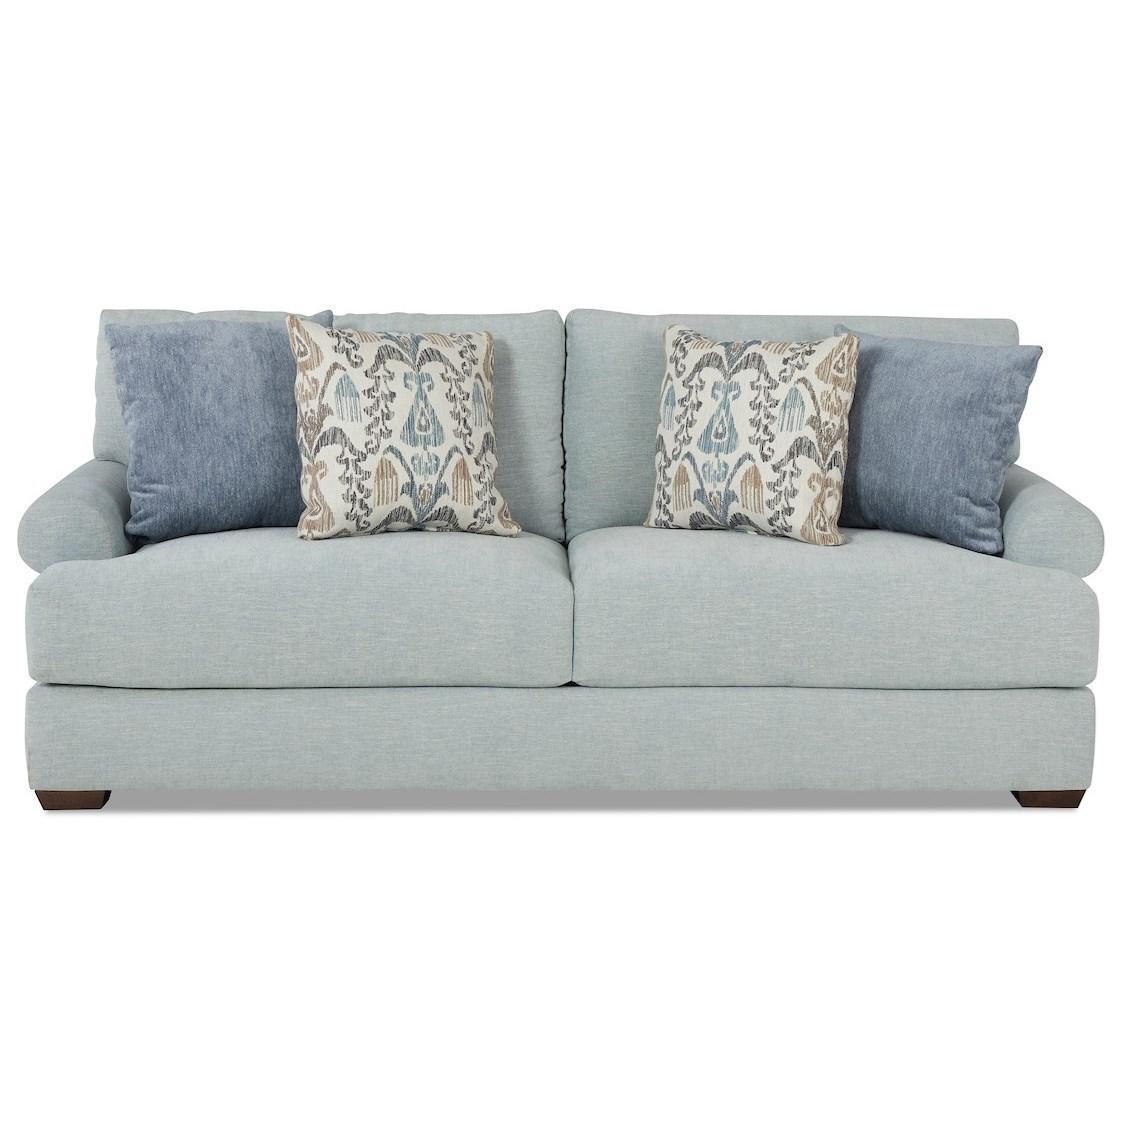 Gaylord Sofa by Klaussner at Johnny Janosik